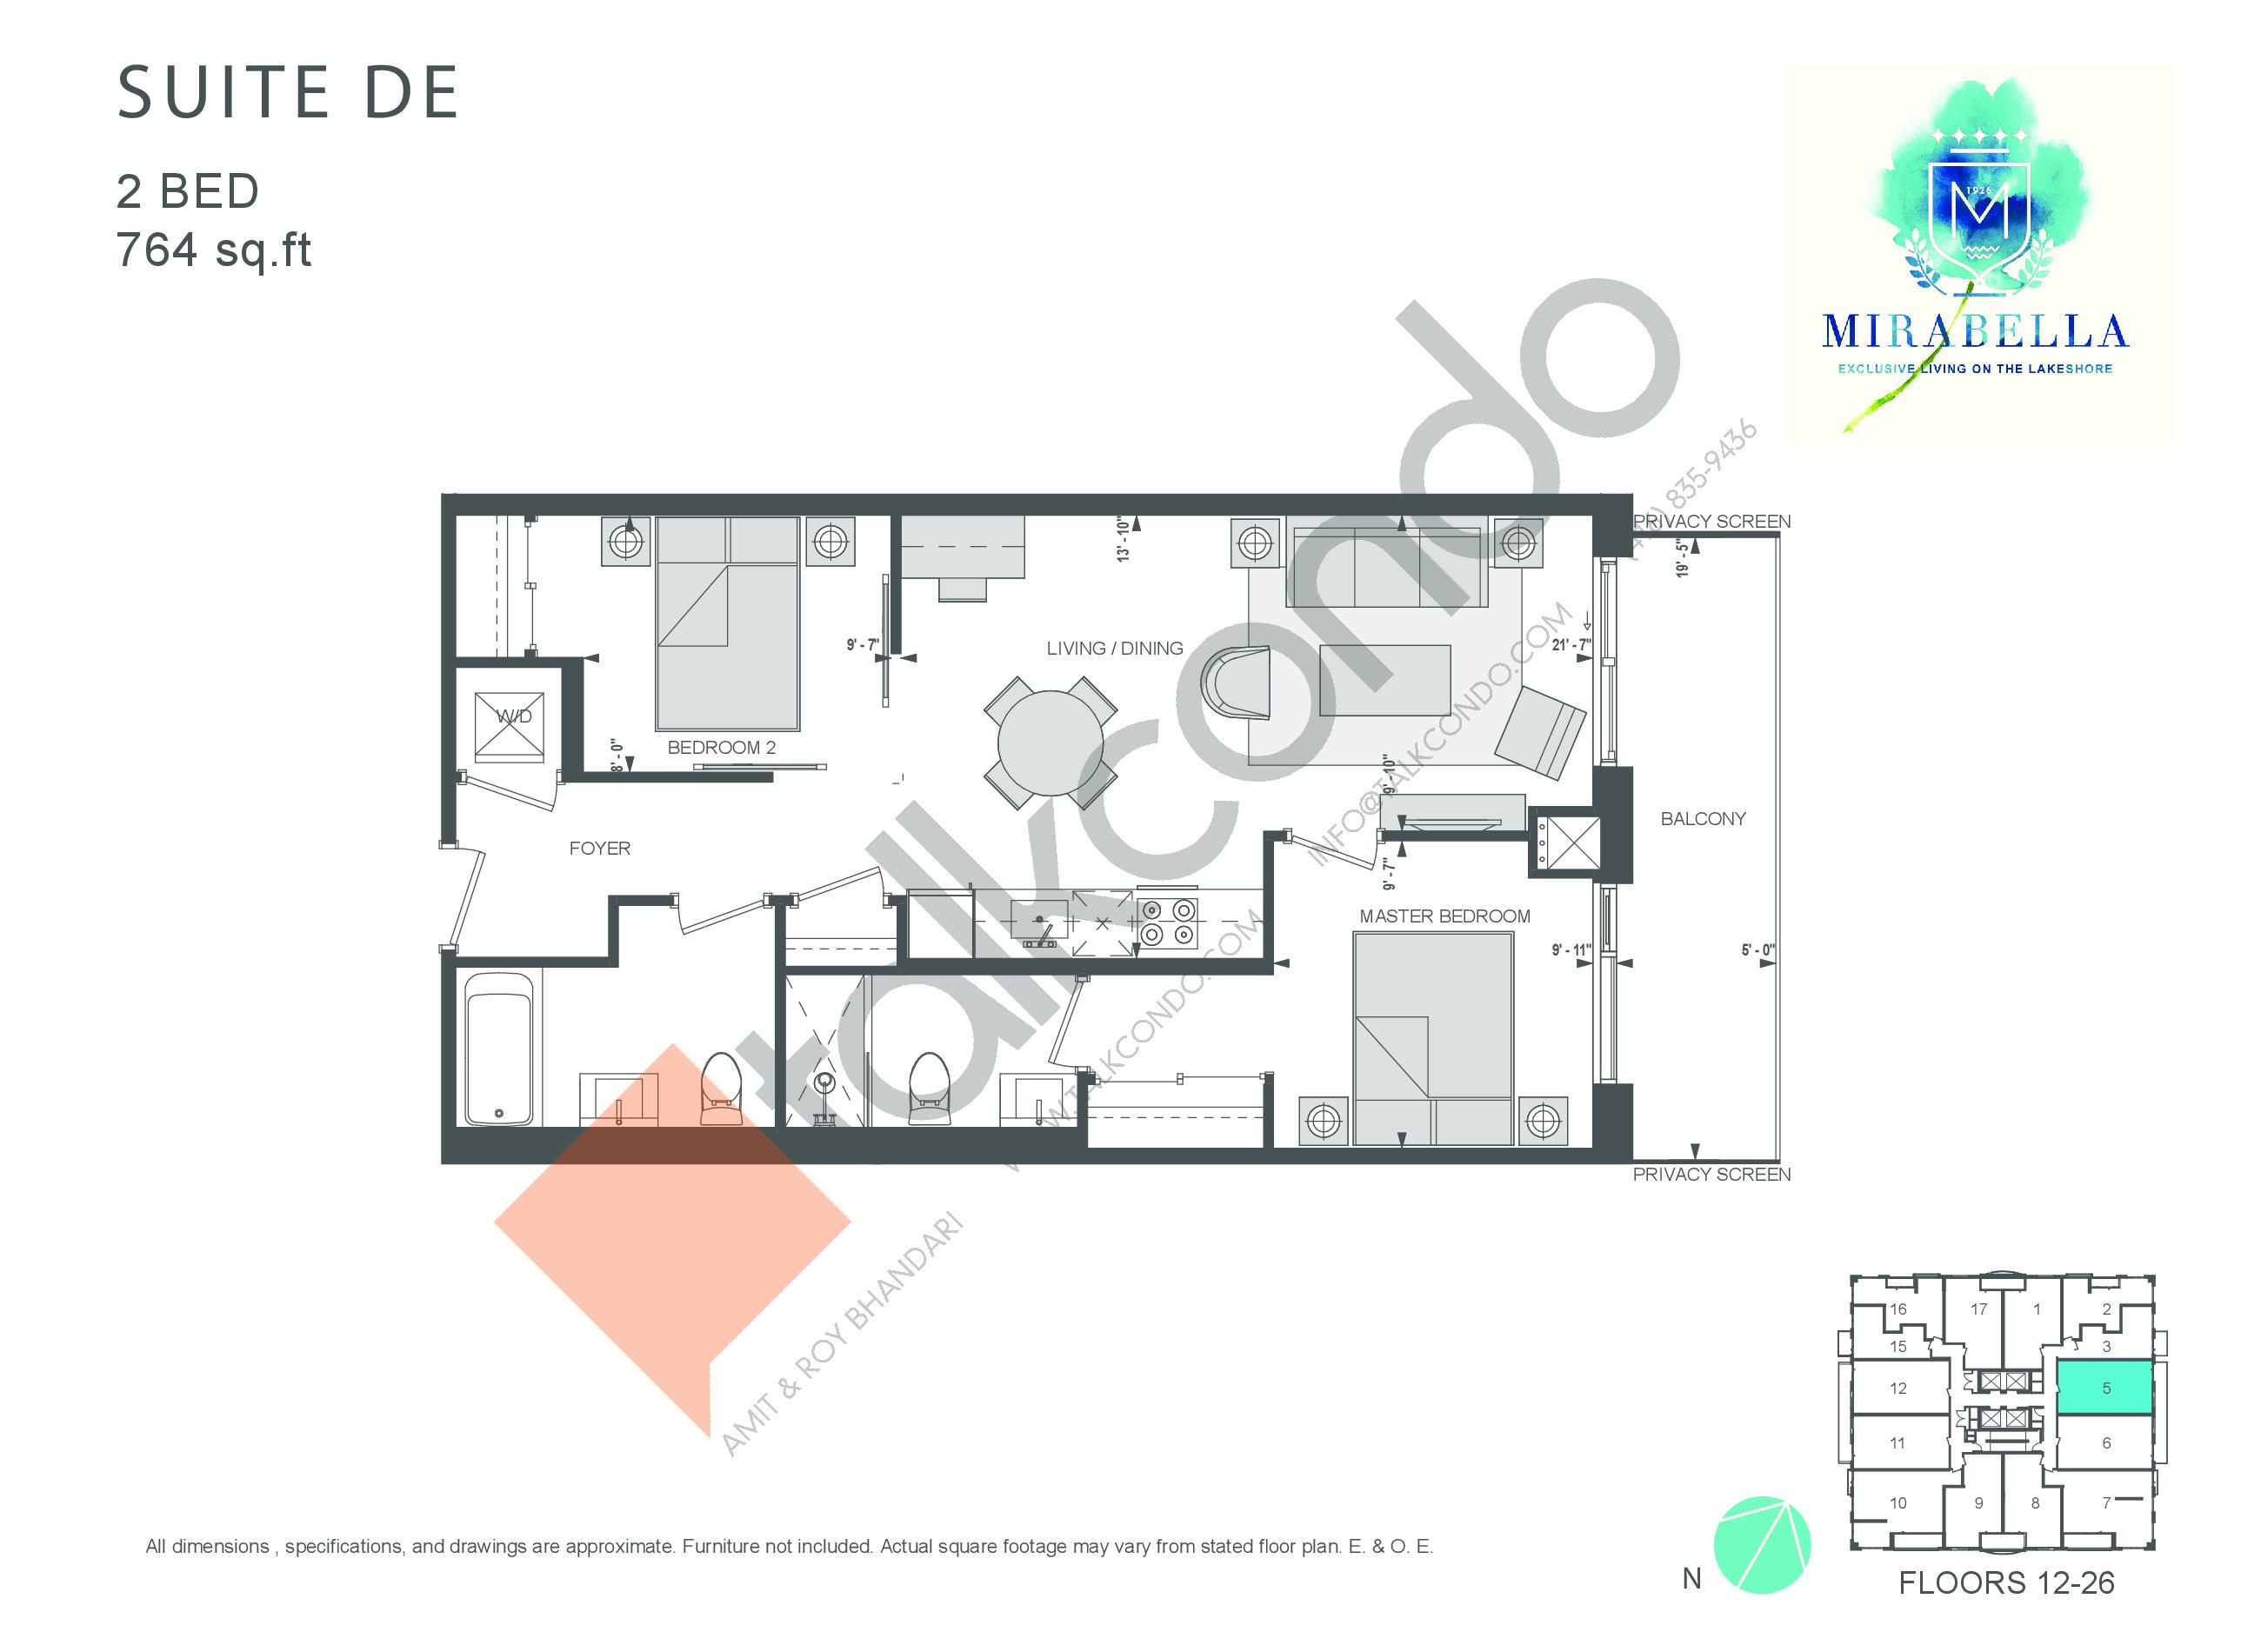 Suite DE Floor Plan at Mirabella Luxury Condos East Tower - 764 sq.ft